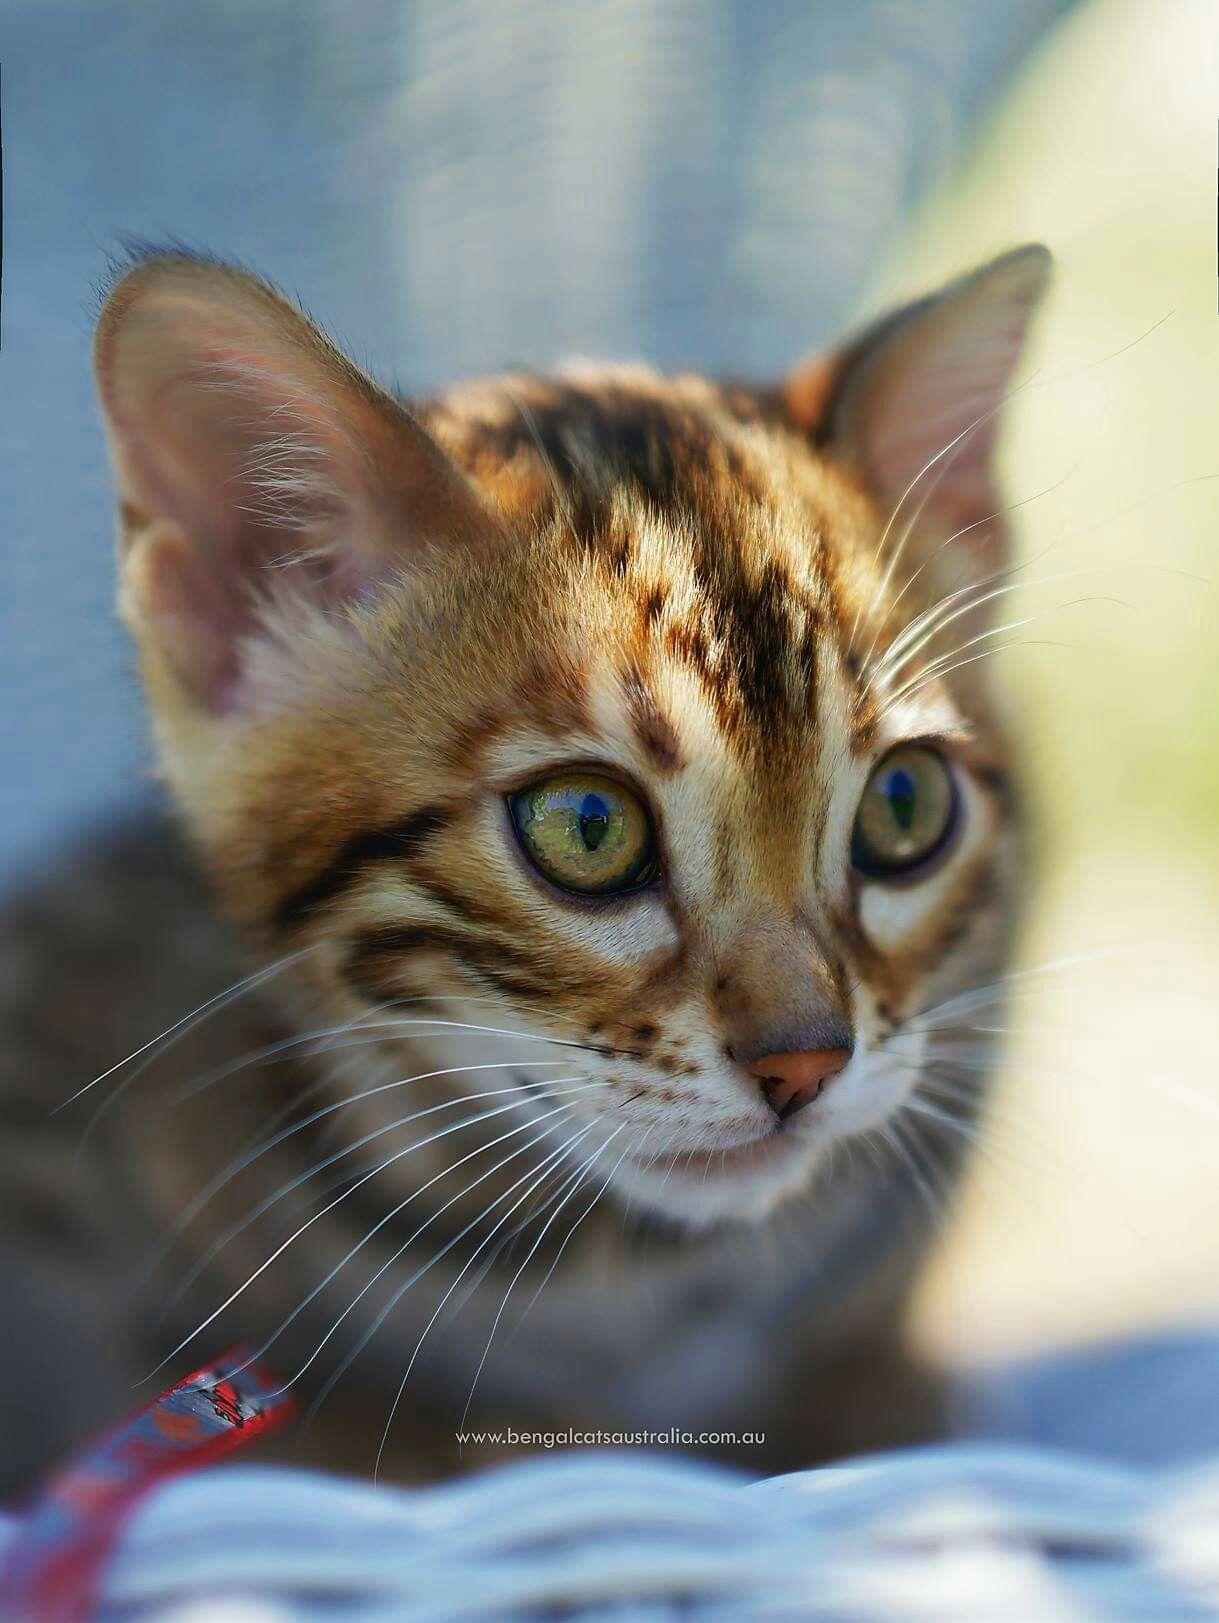 Bengal Cats Australia. Breeding Bengal cats since 2009. We ...